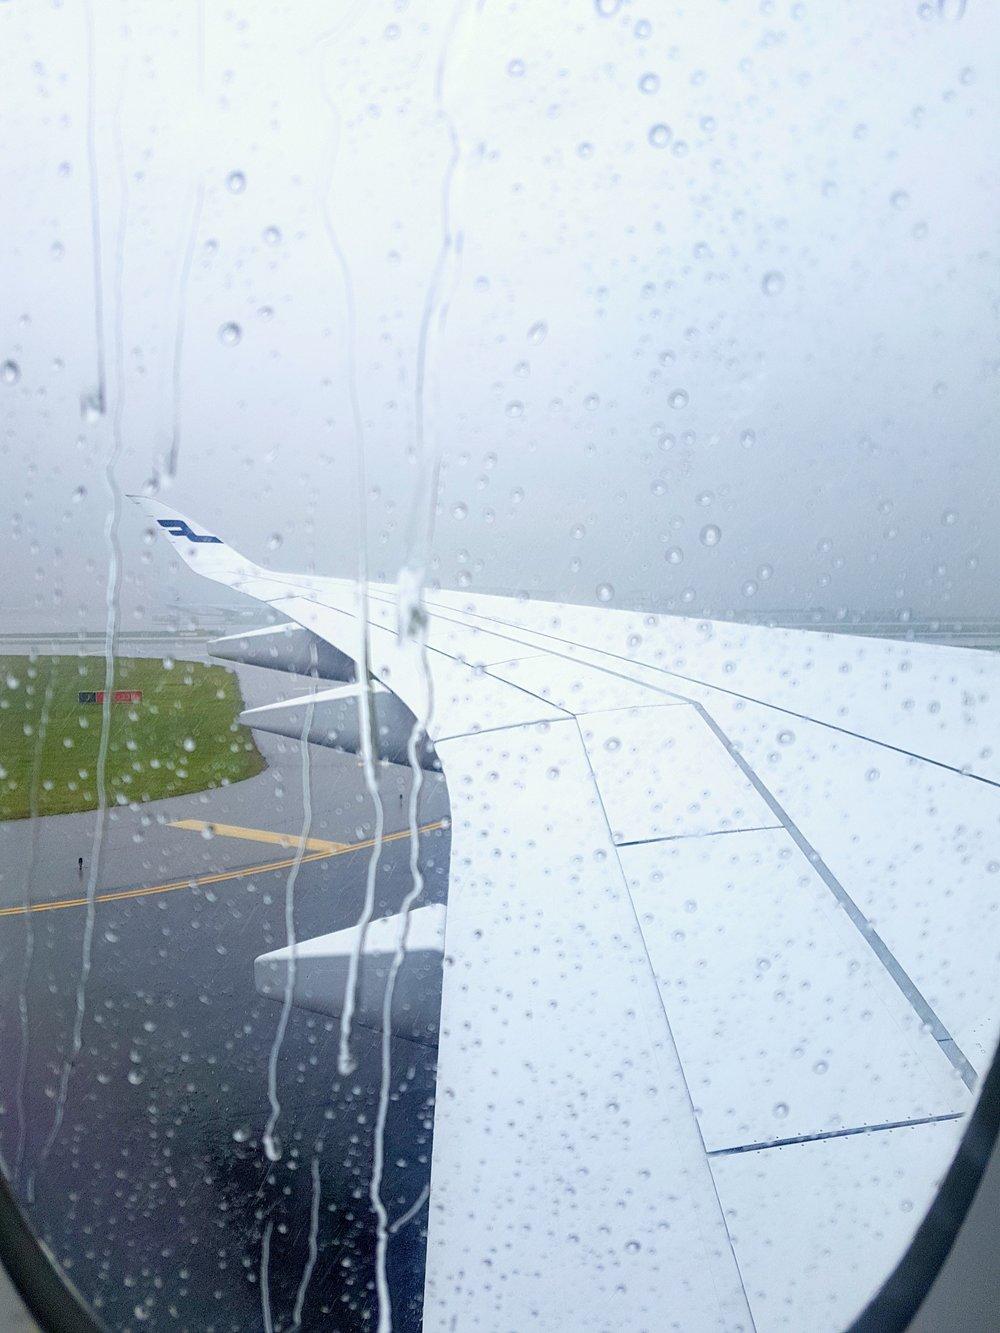 Just landed to rainy Seoul.